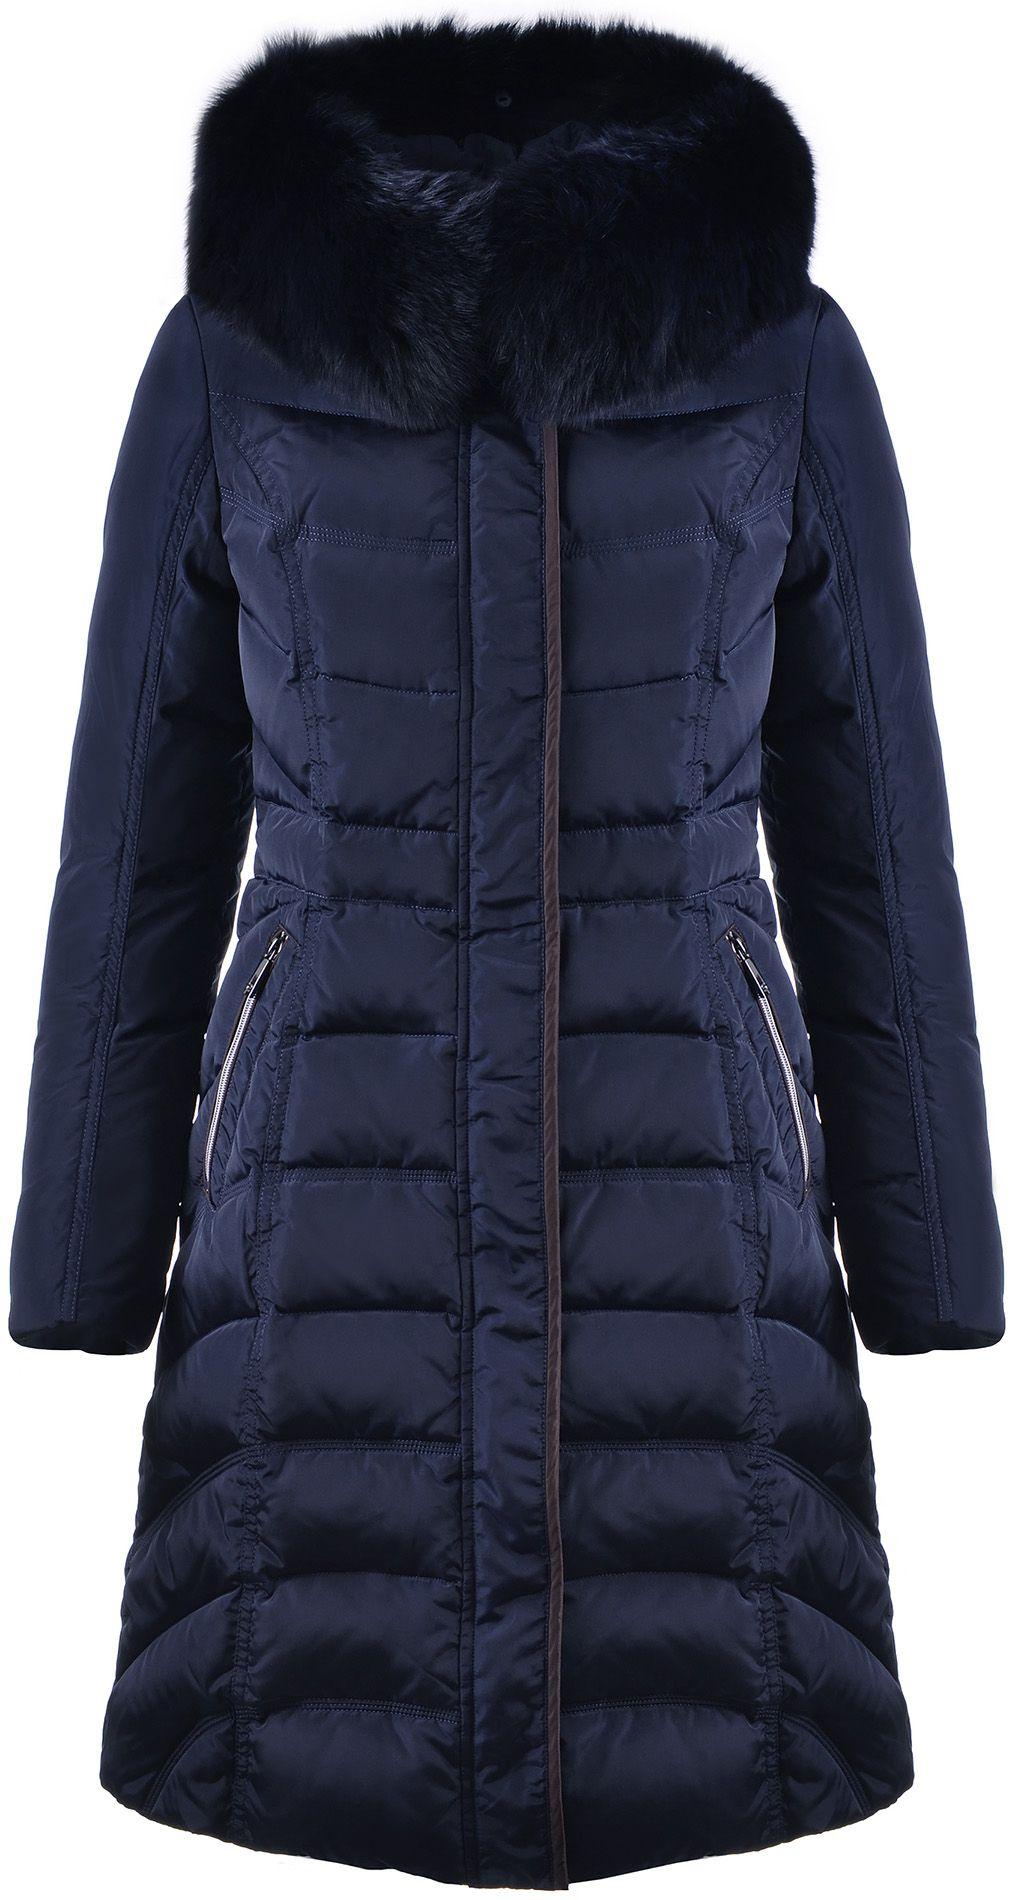 1ac70a100d57 Prošívaný péřový kabát - bunda Snowimage